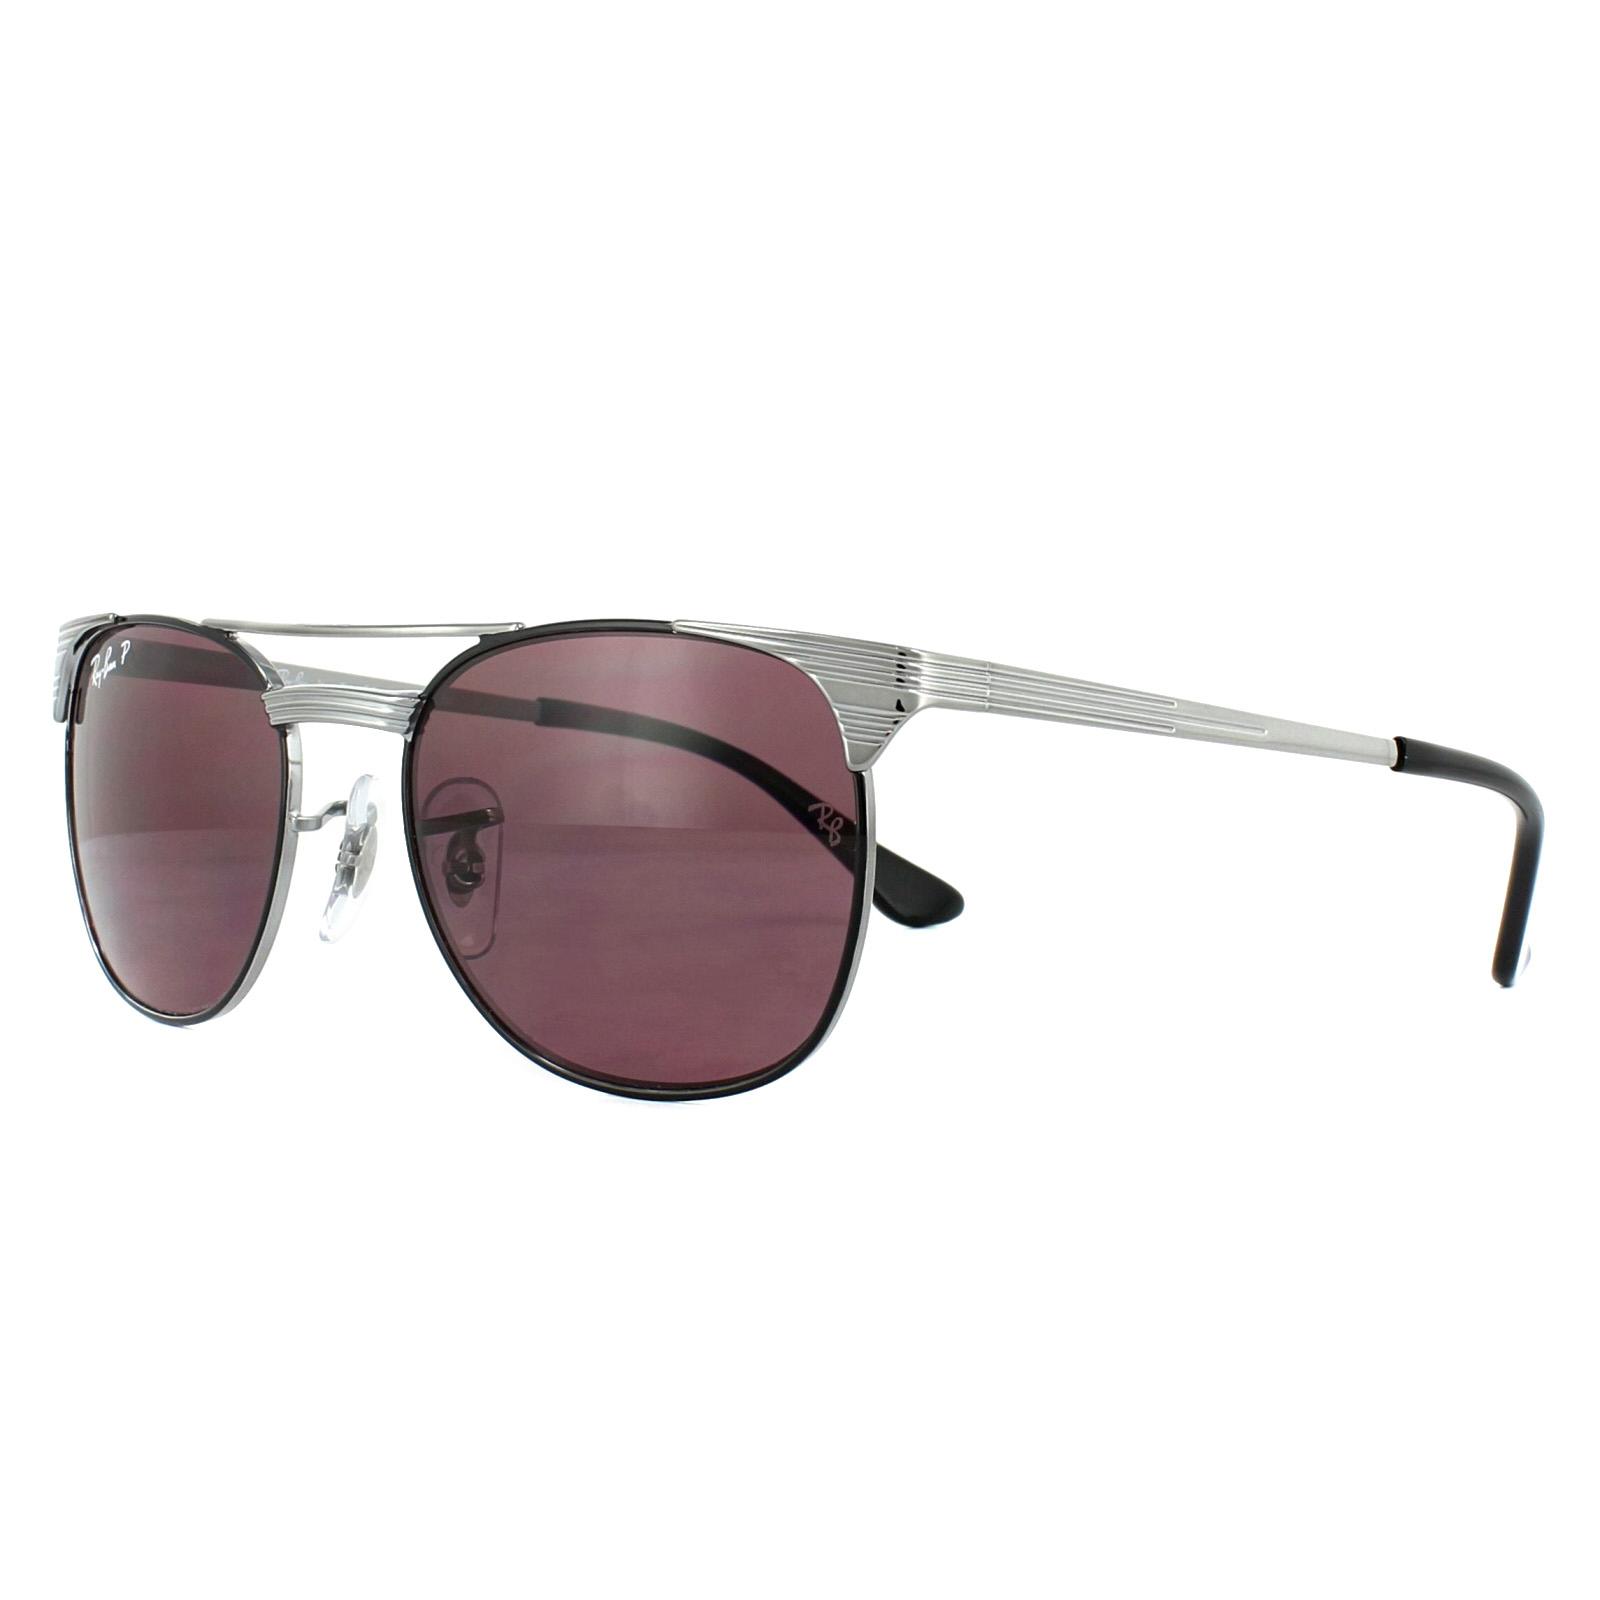 Sentinel Ray-Ban Junior Sunglasses Signet 9540S 259 5Q Gunmetal Black  Violet Polarized L a962161203fc